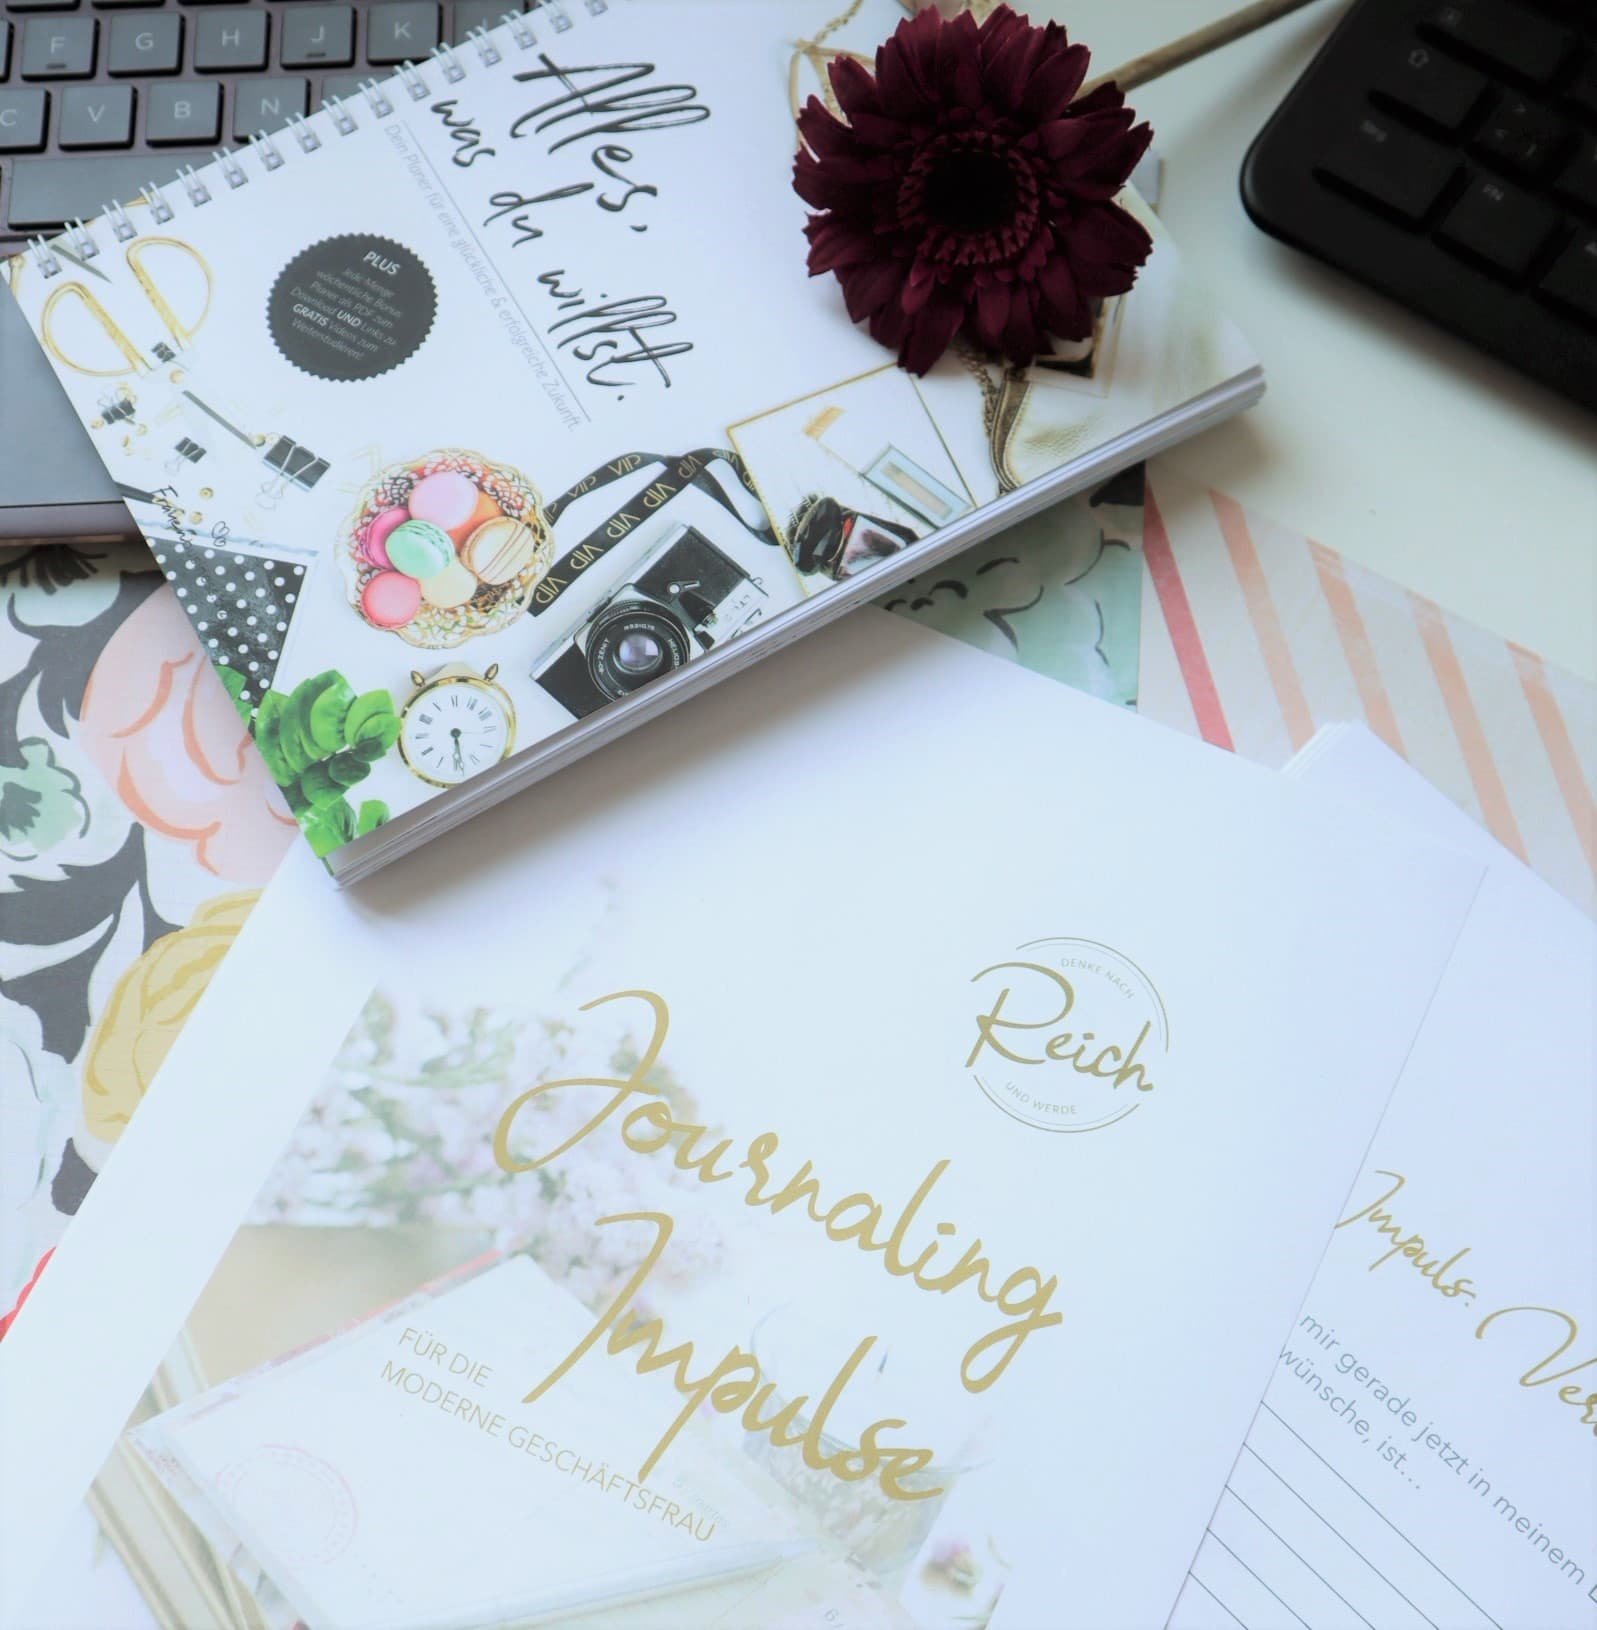 Kostenlose Journaling Impulse von Kathrin Luty